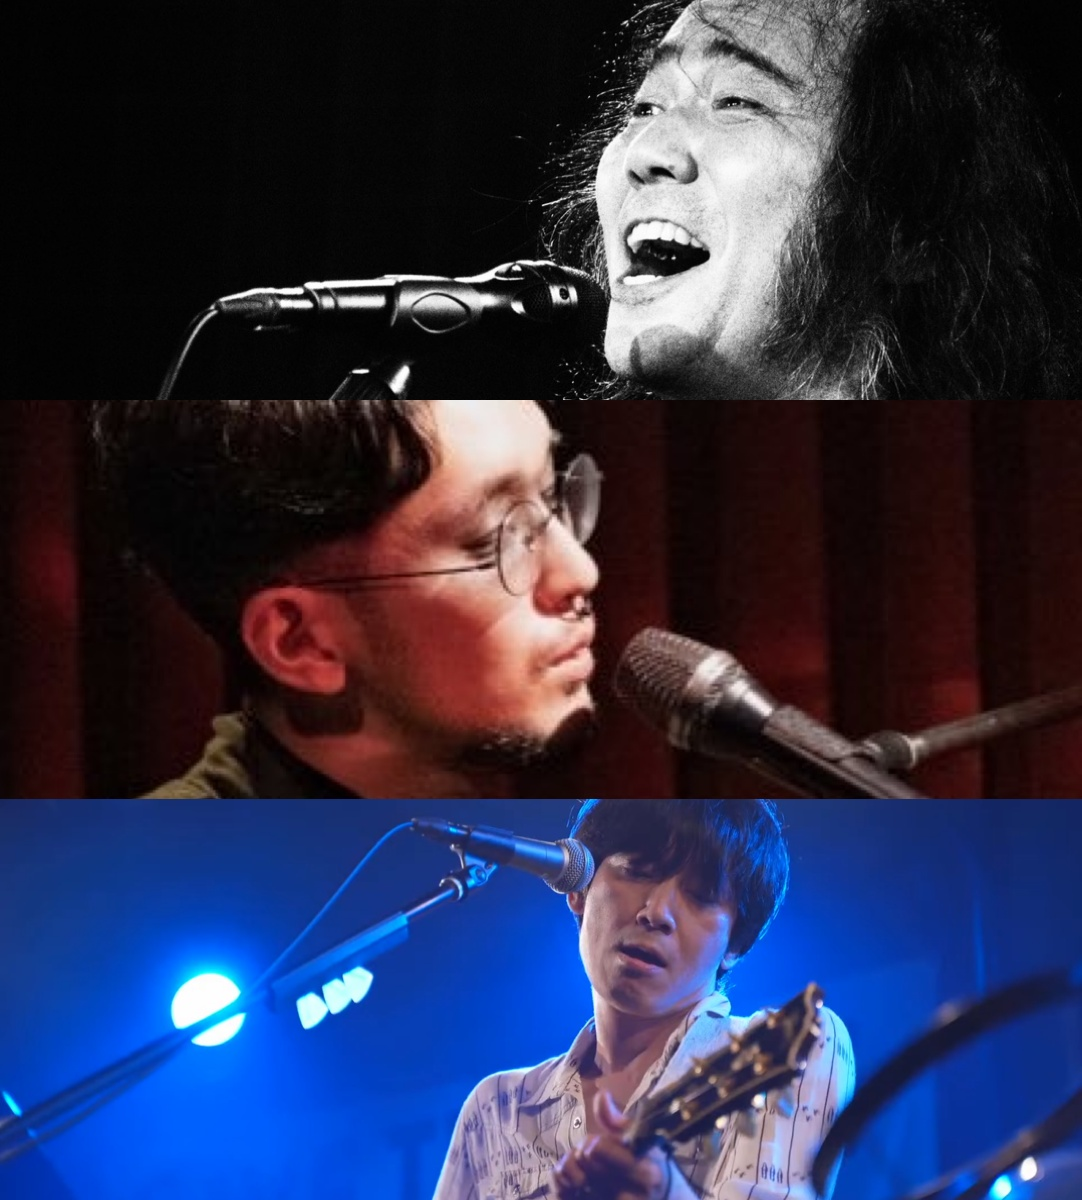 [無観客配信]『仮面/ペルソナ』出演:小林薫 / 粘液 / 哲史+青花